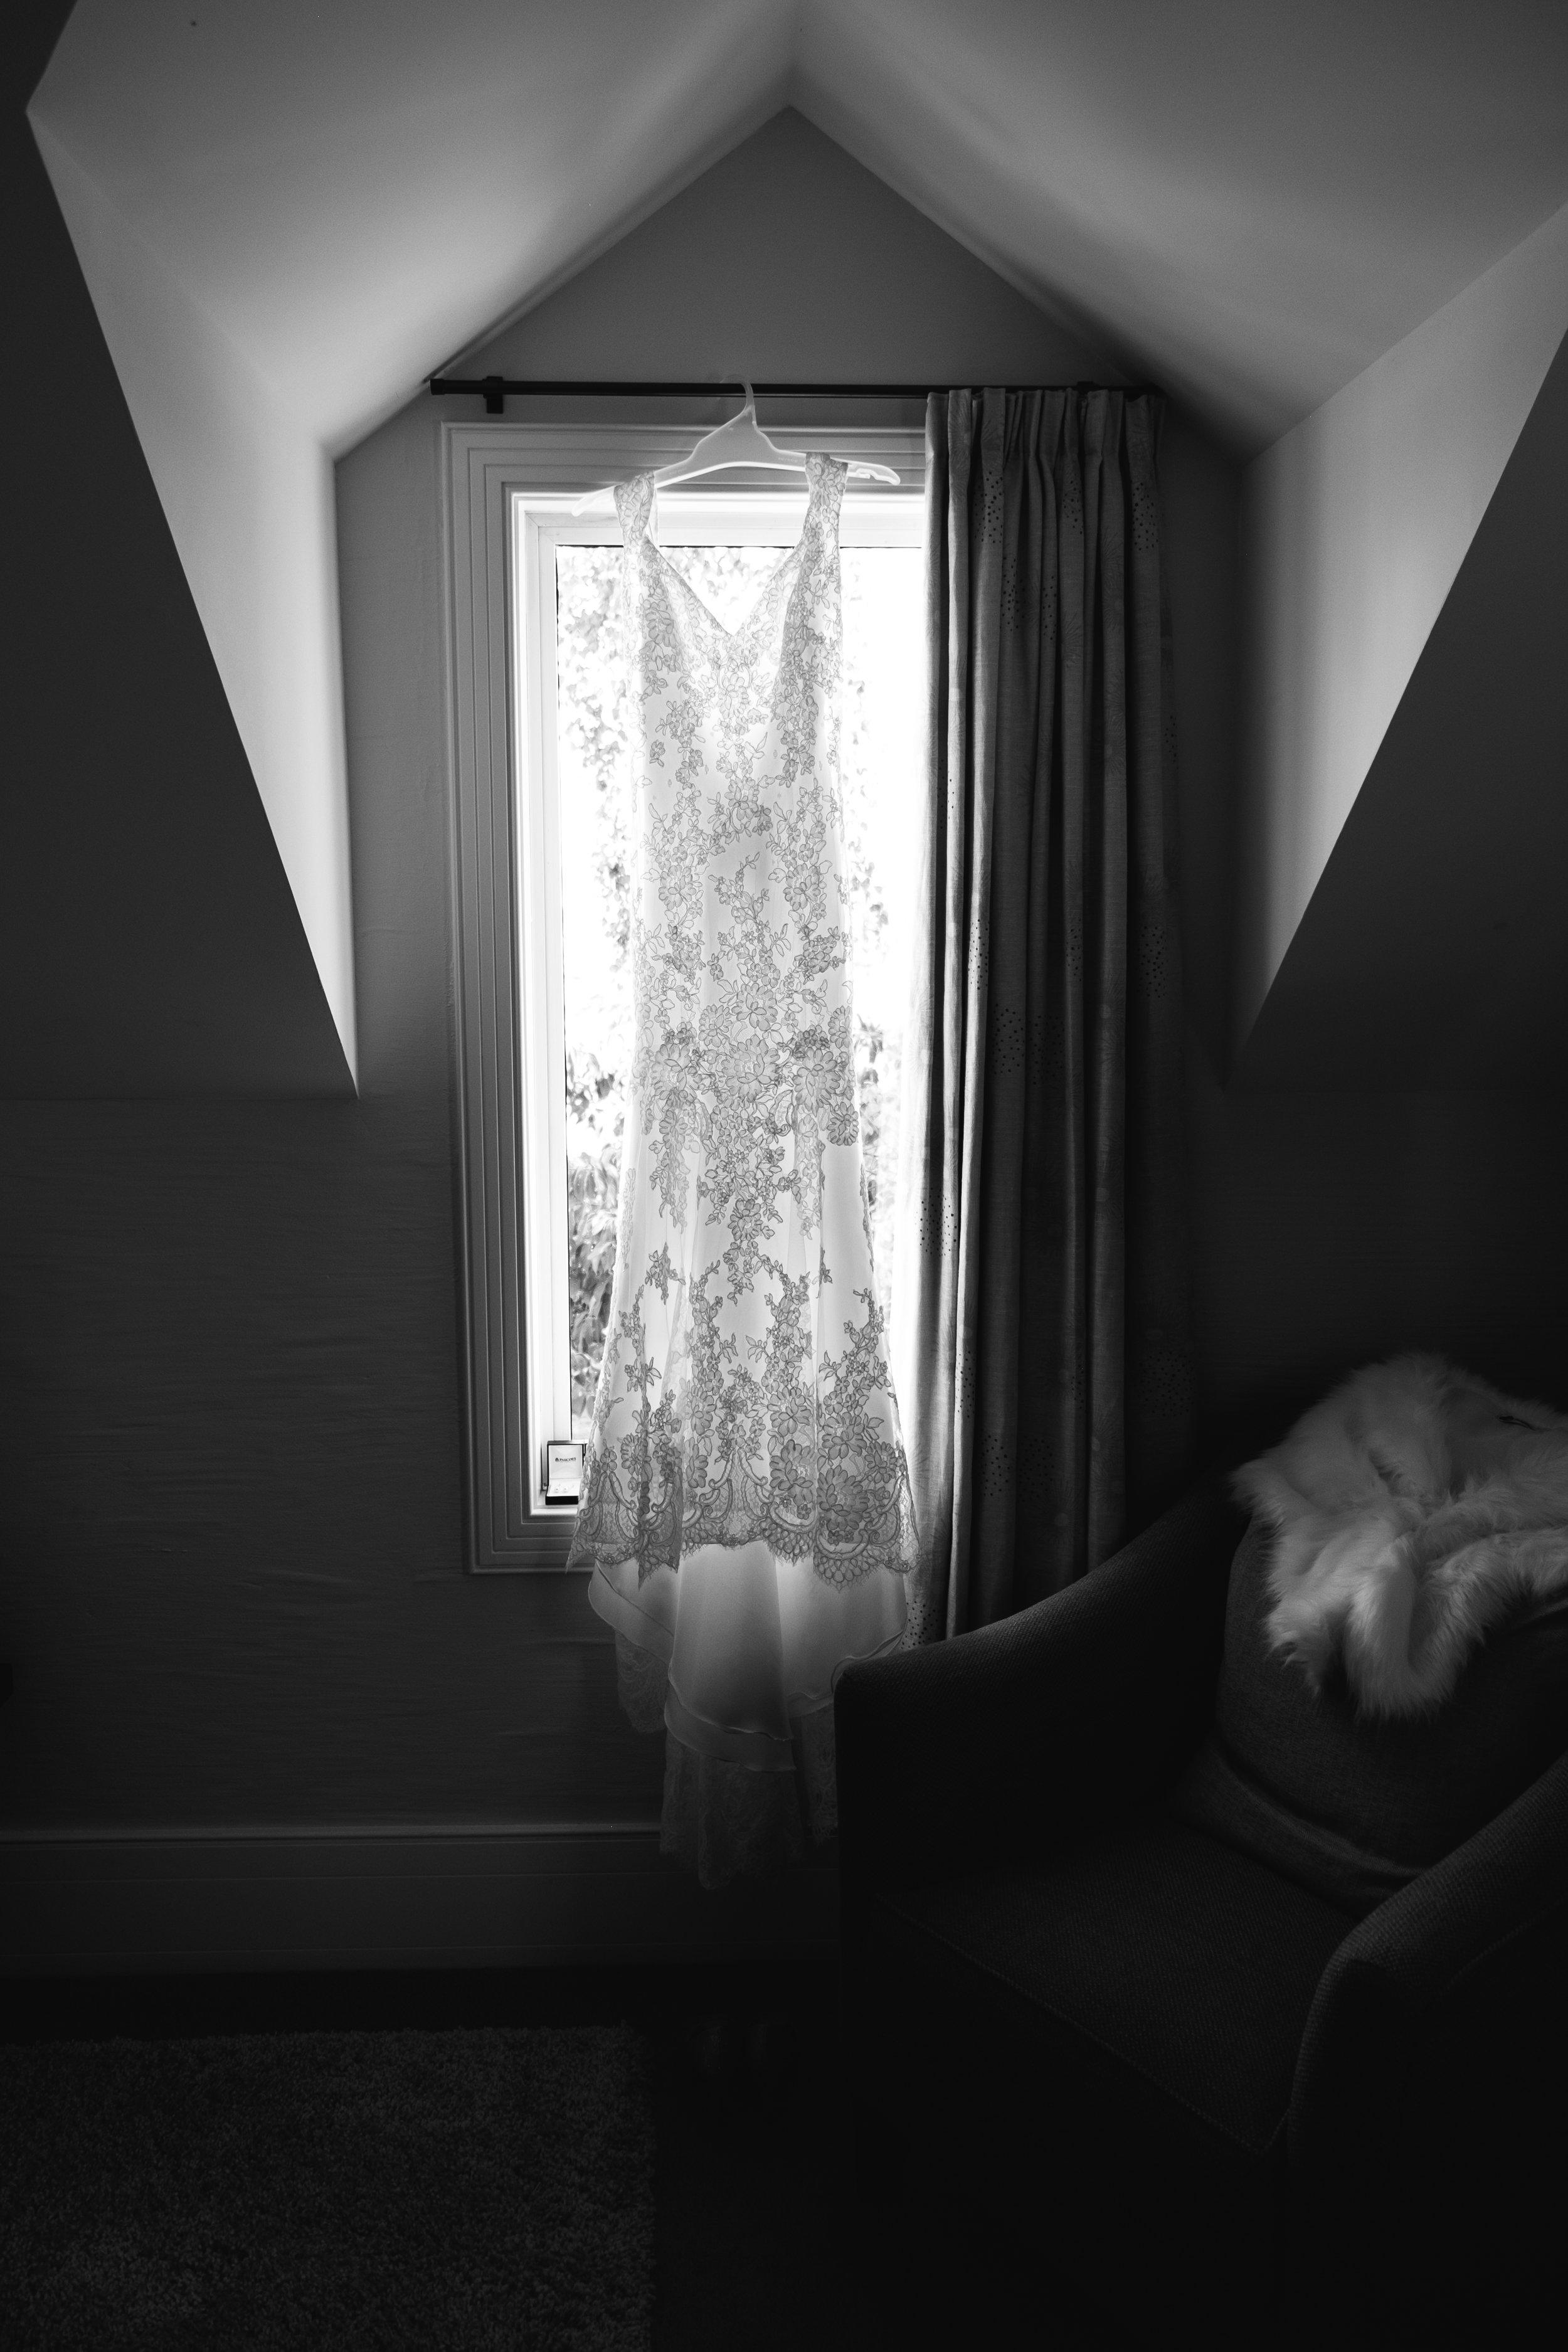 MattandHayleyWeddingApril2017-JKPhoto-2017-135.jpg